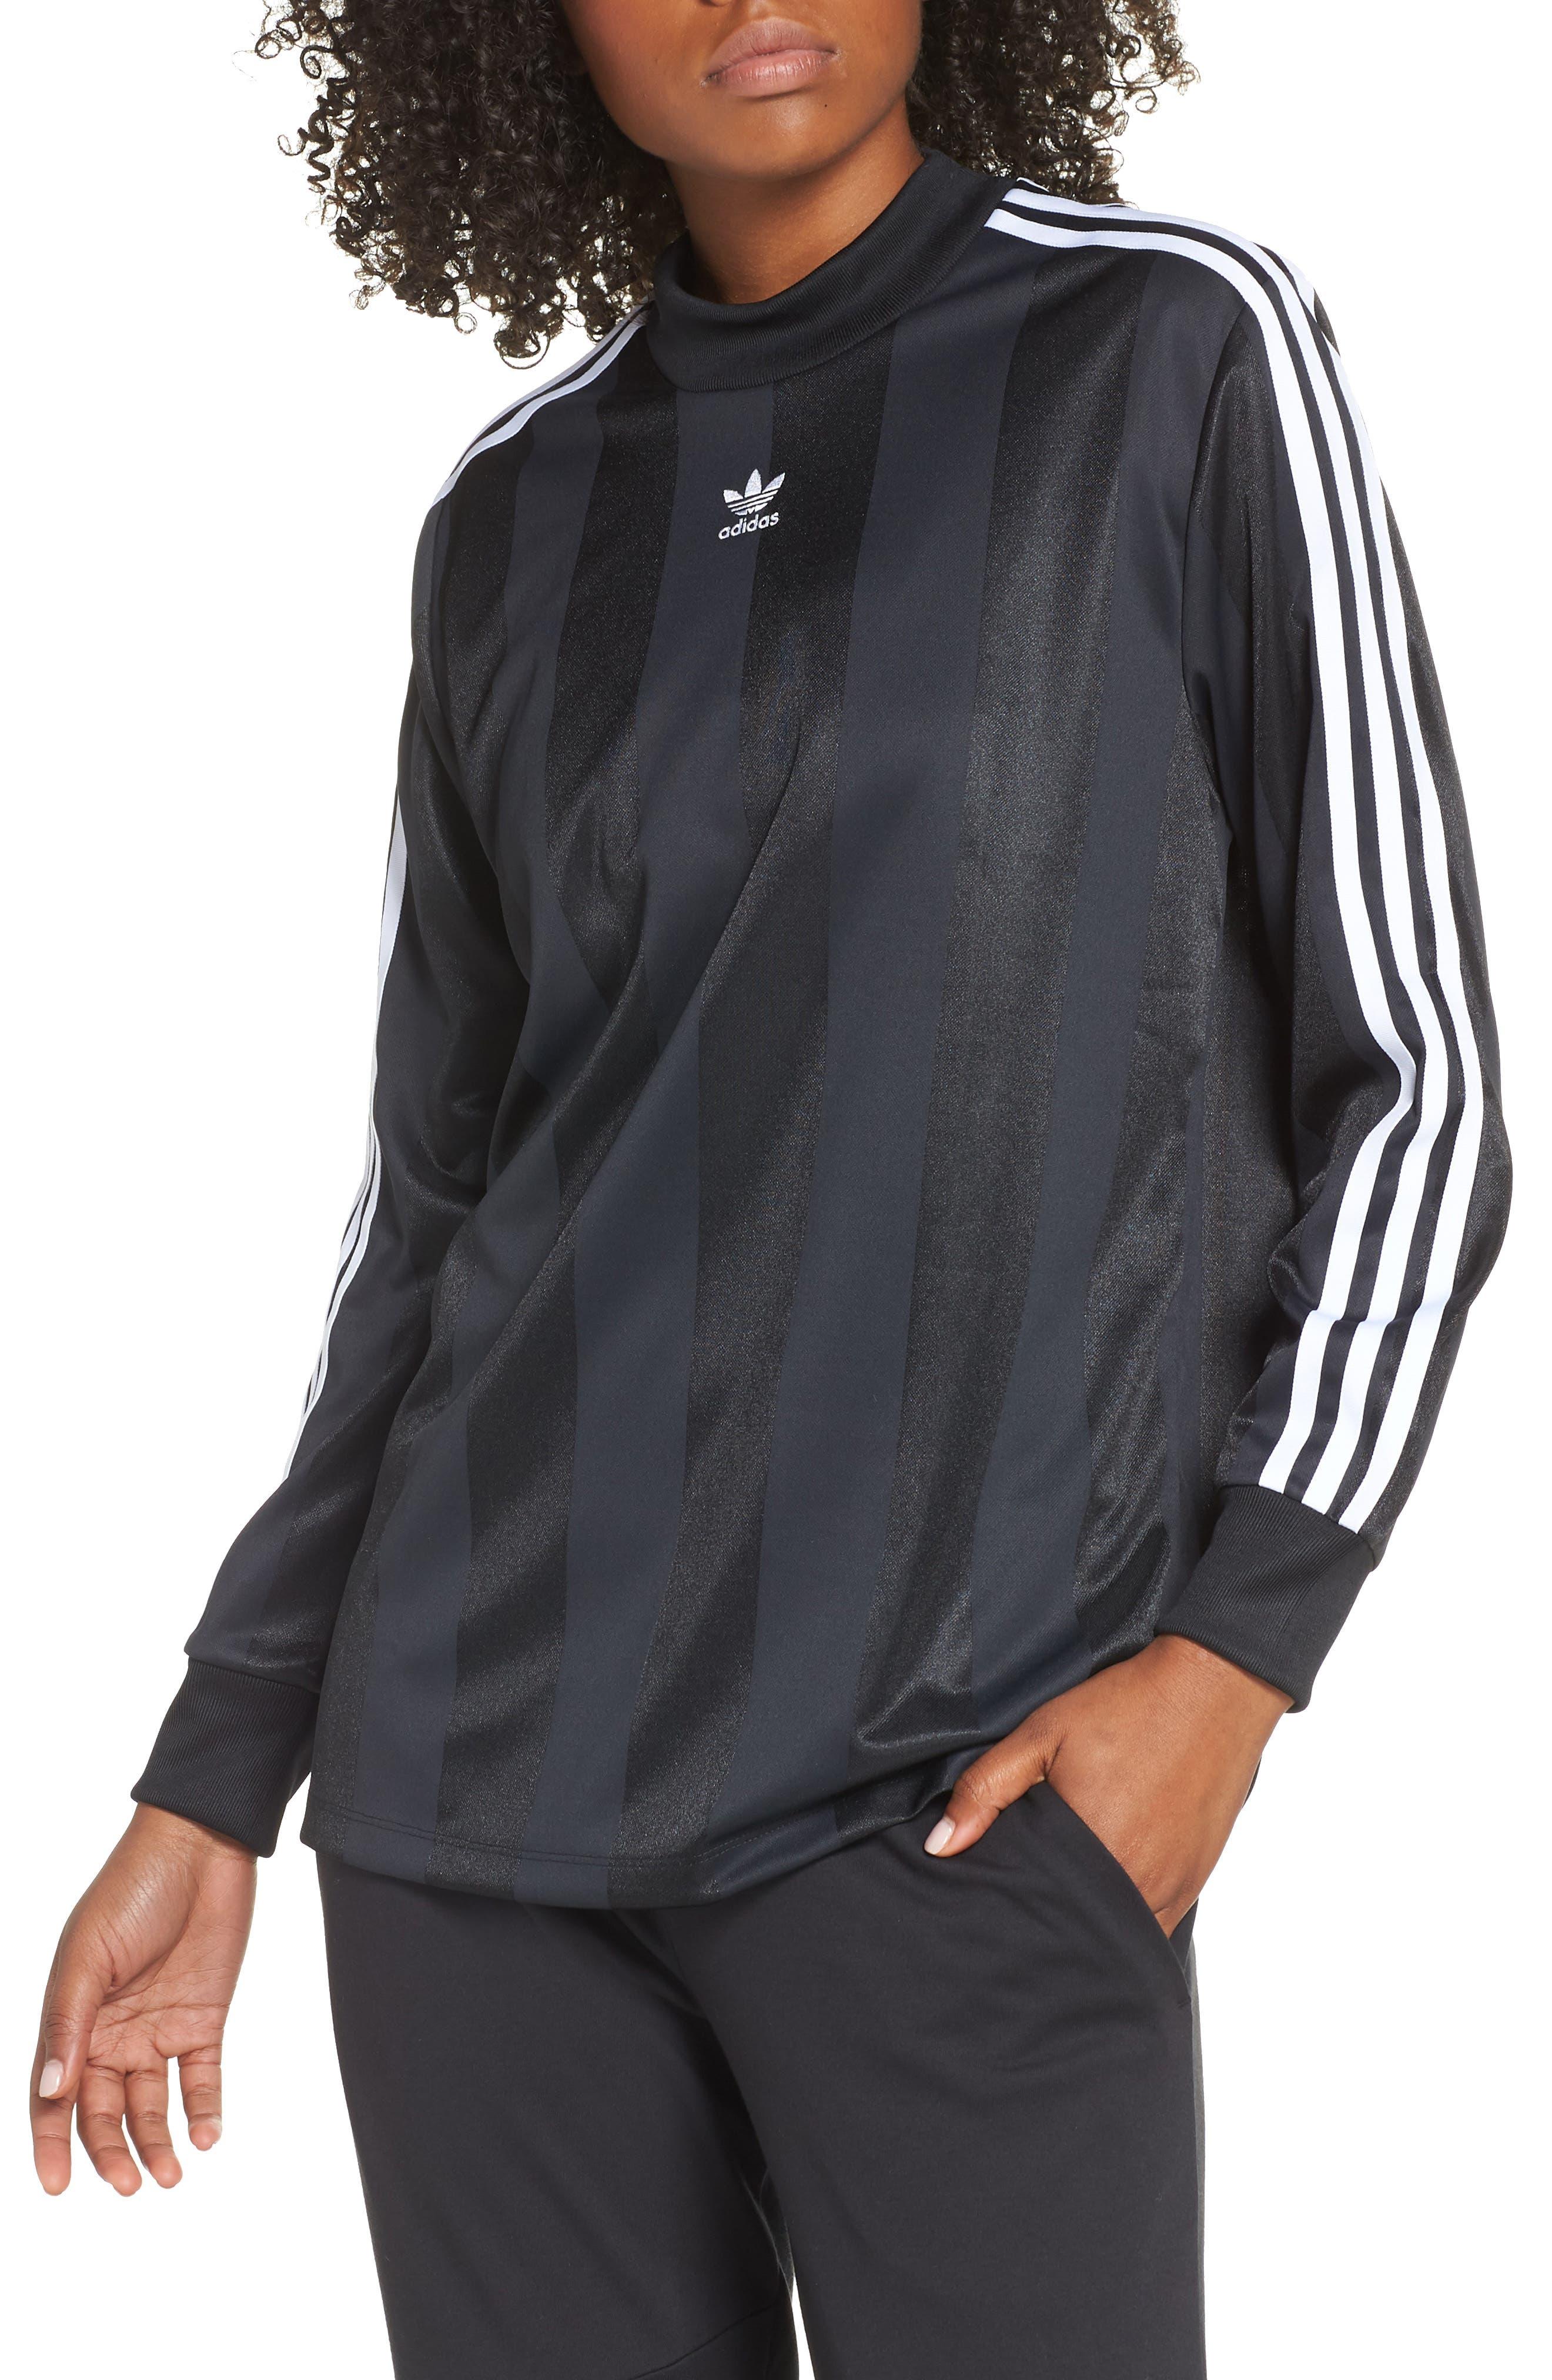 Adidas 3-Stripes Long Sleeve Tee, Black